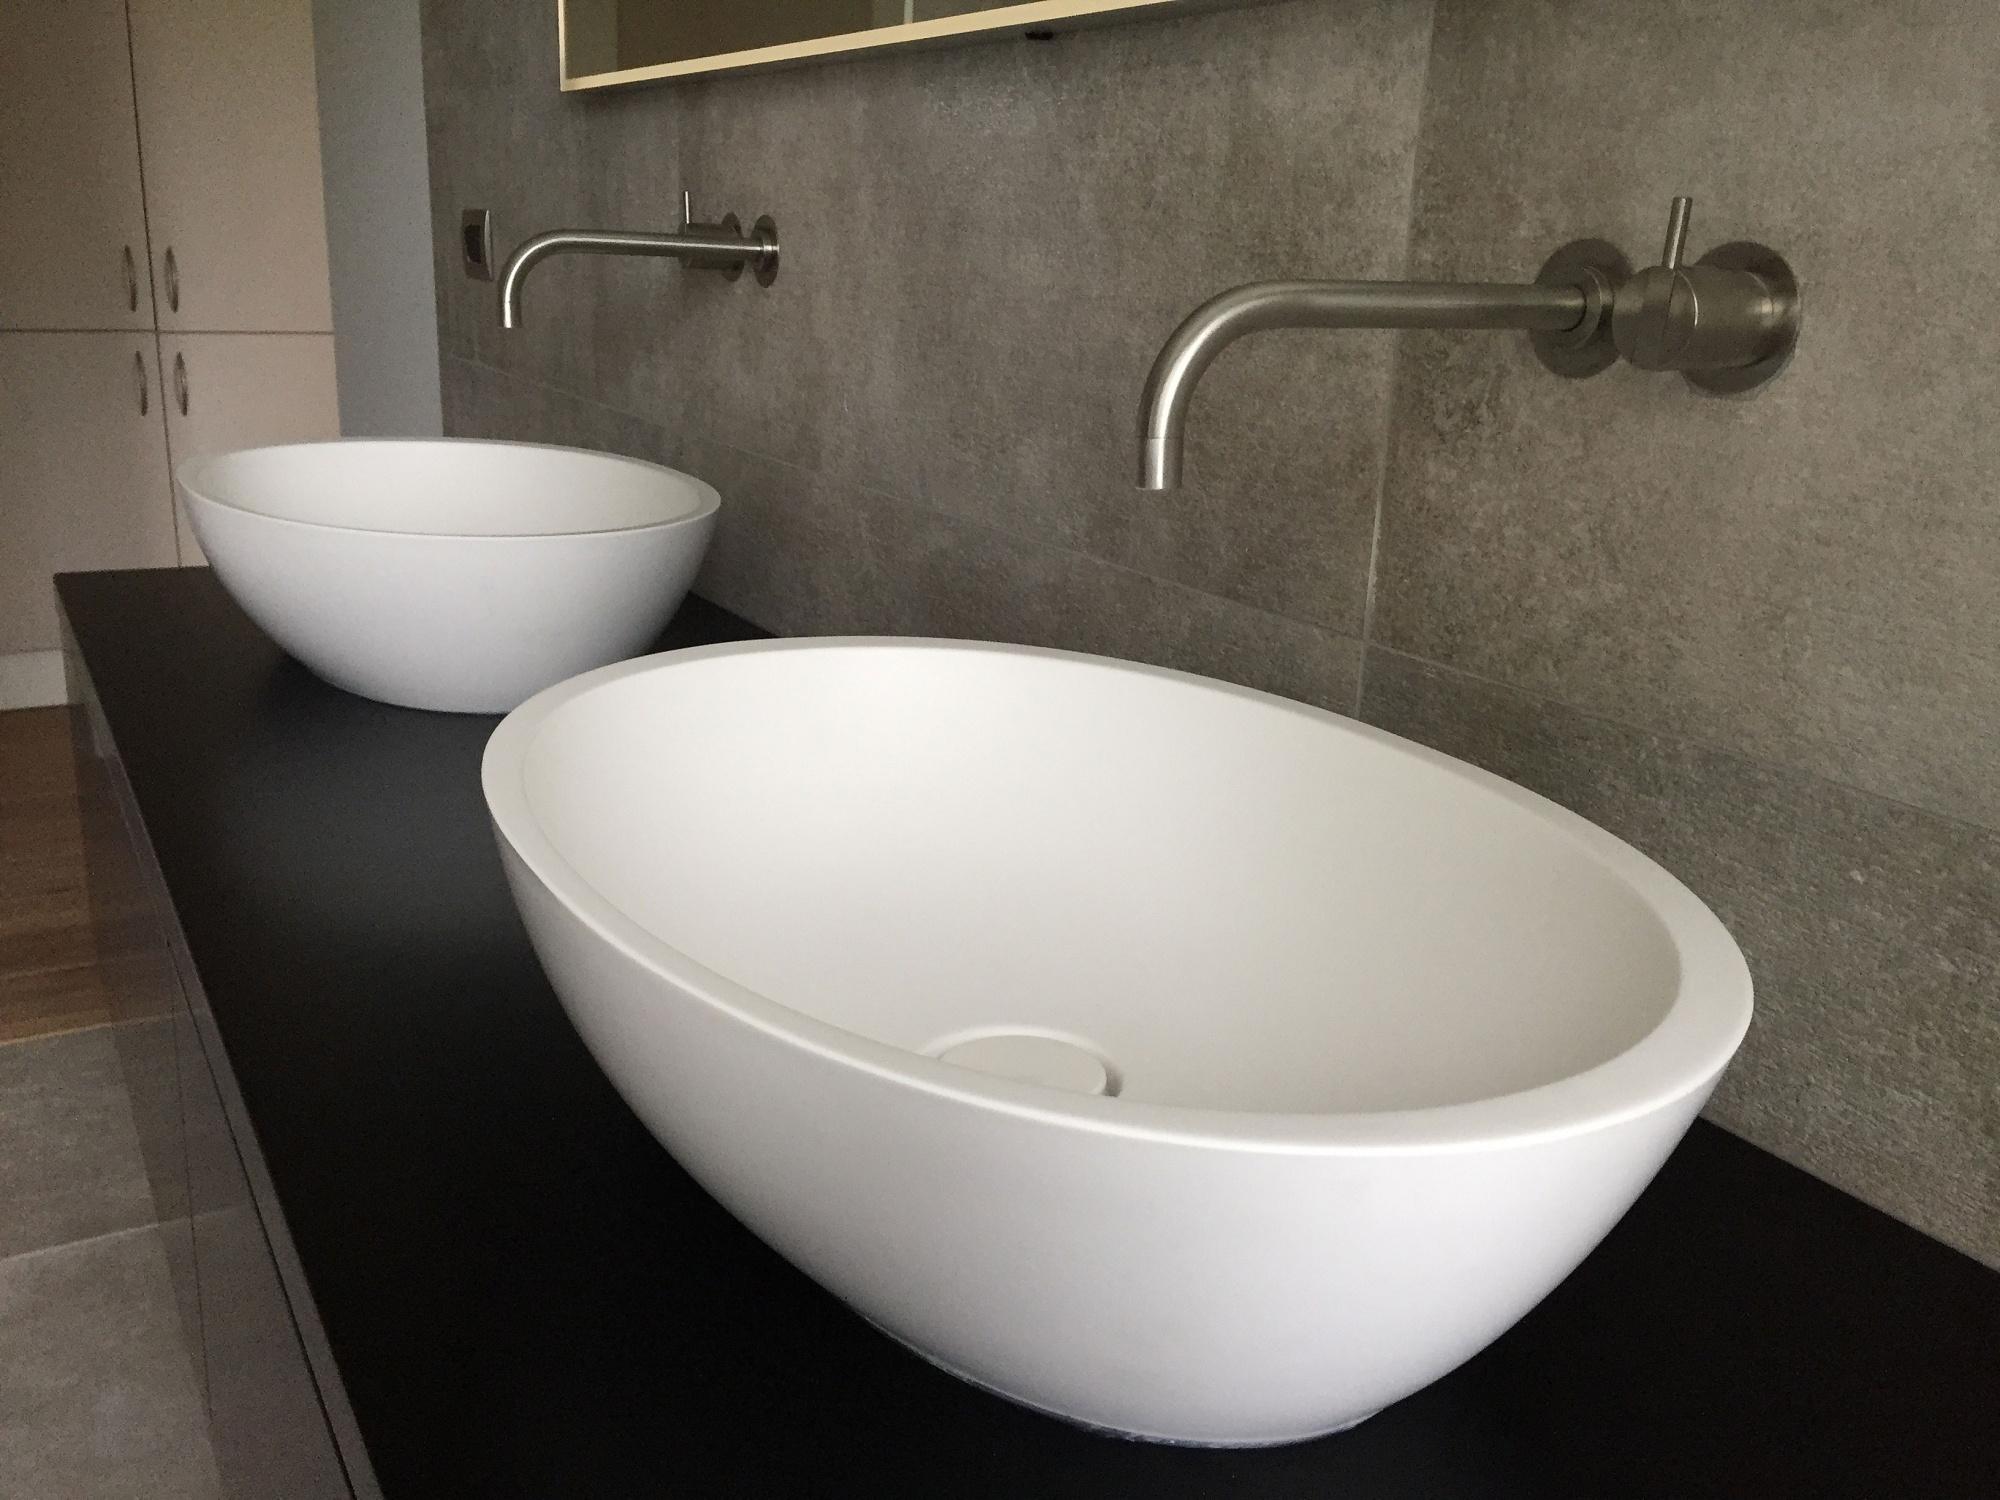 Design Badkamer Matten : Strakke badkamers met mat wit sanitair alligna keuken bad